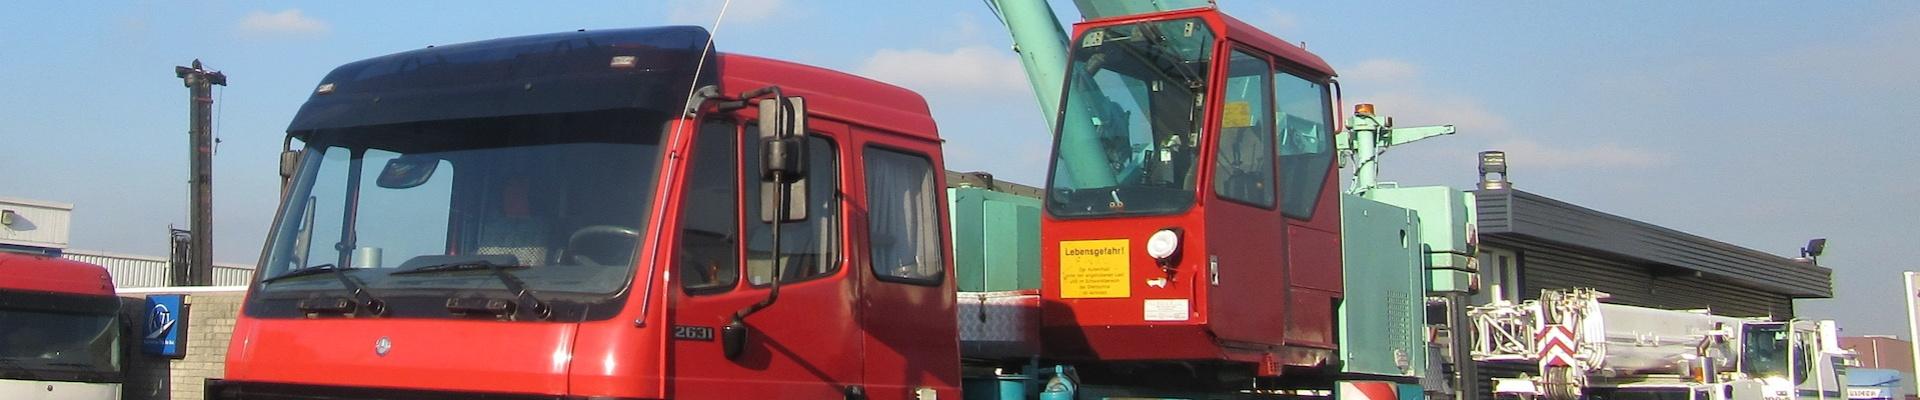 Автокран LIEBHERR, модел LTF 1030 (снимка)